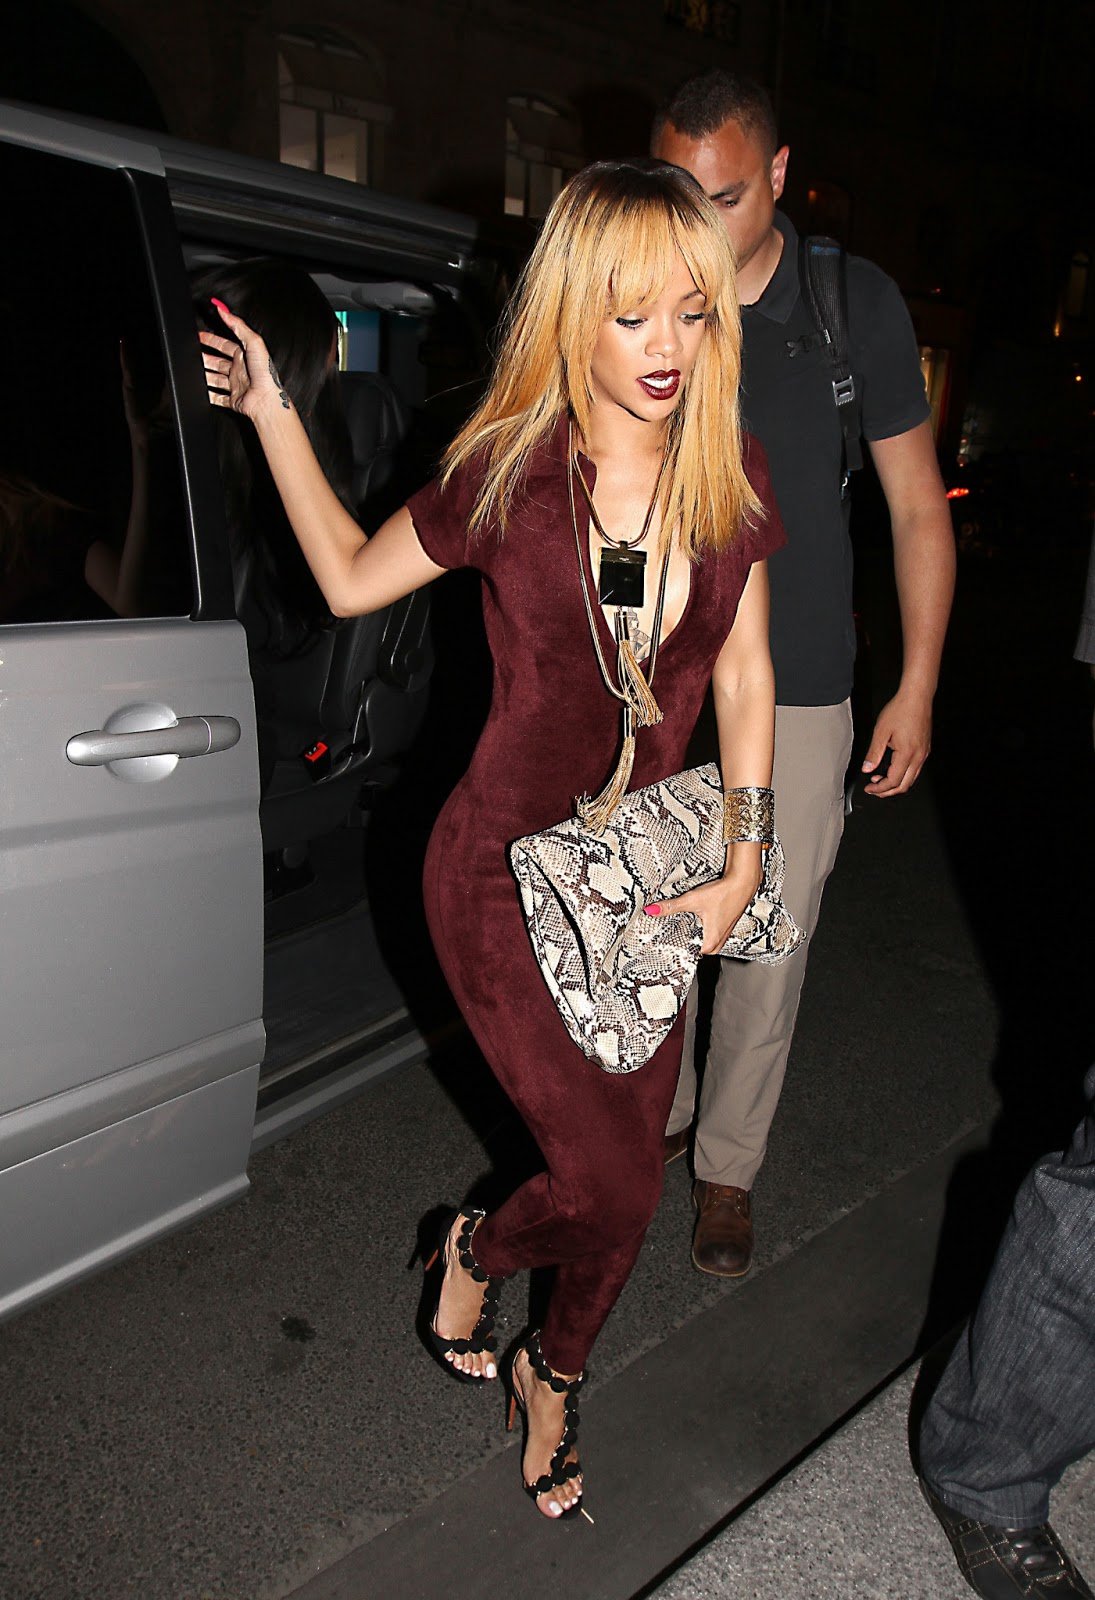 Rolls Royce Miami >> Rihanna - Skin Tight Bodysuit | Just FAB Celebs